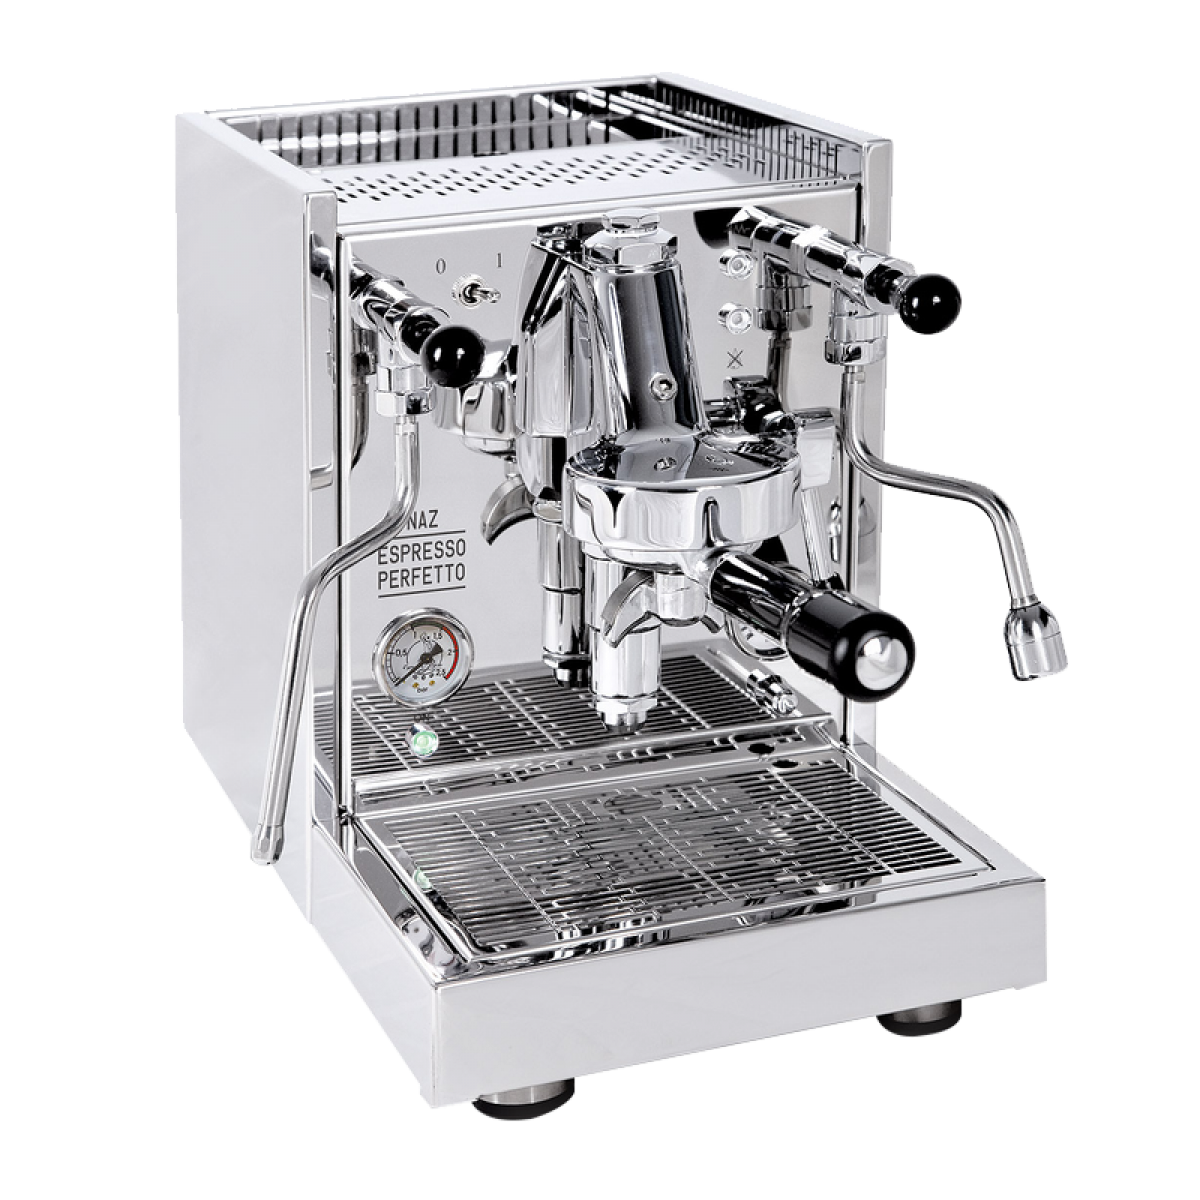 Quick Mill RUBINO 0981 Naz Espressomaschine Sonderedition